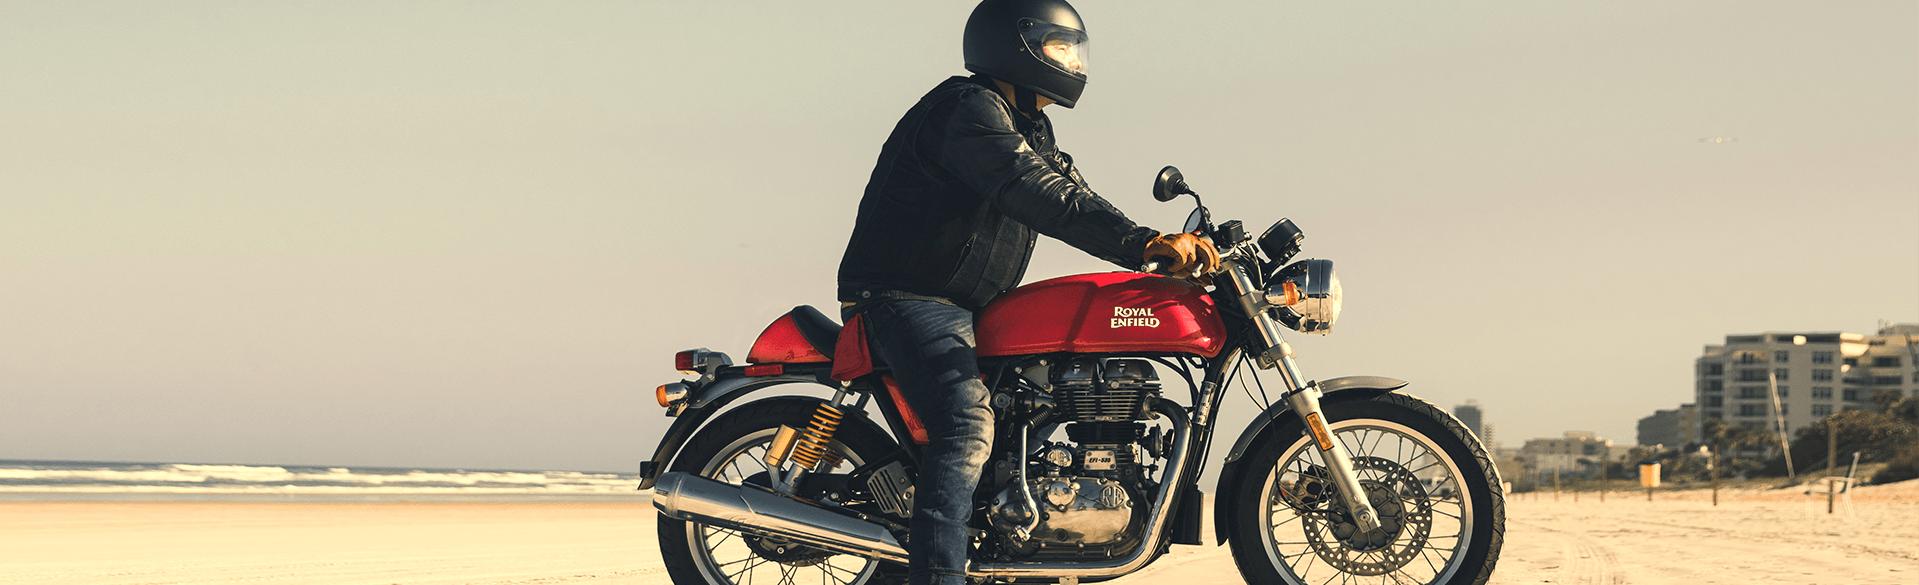 motorcycle dealer nj